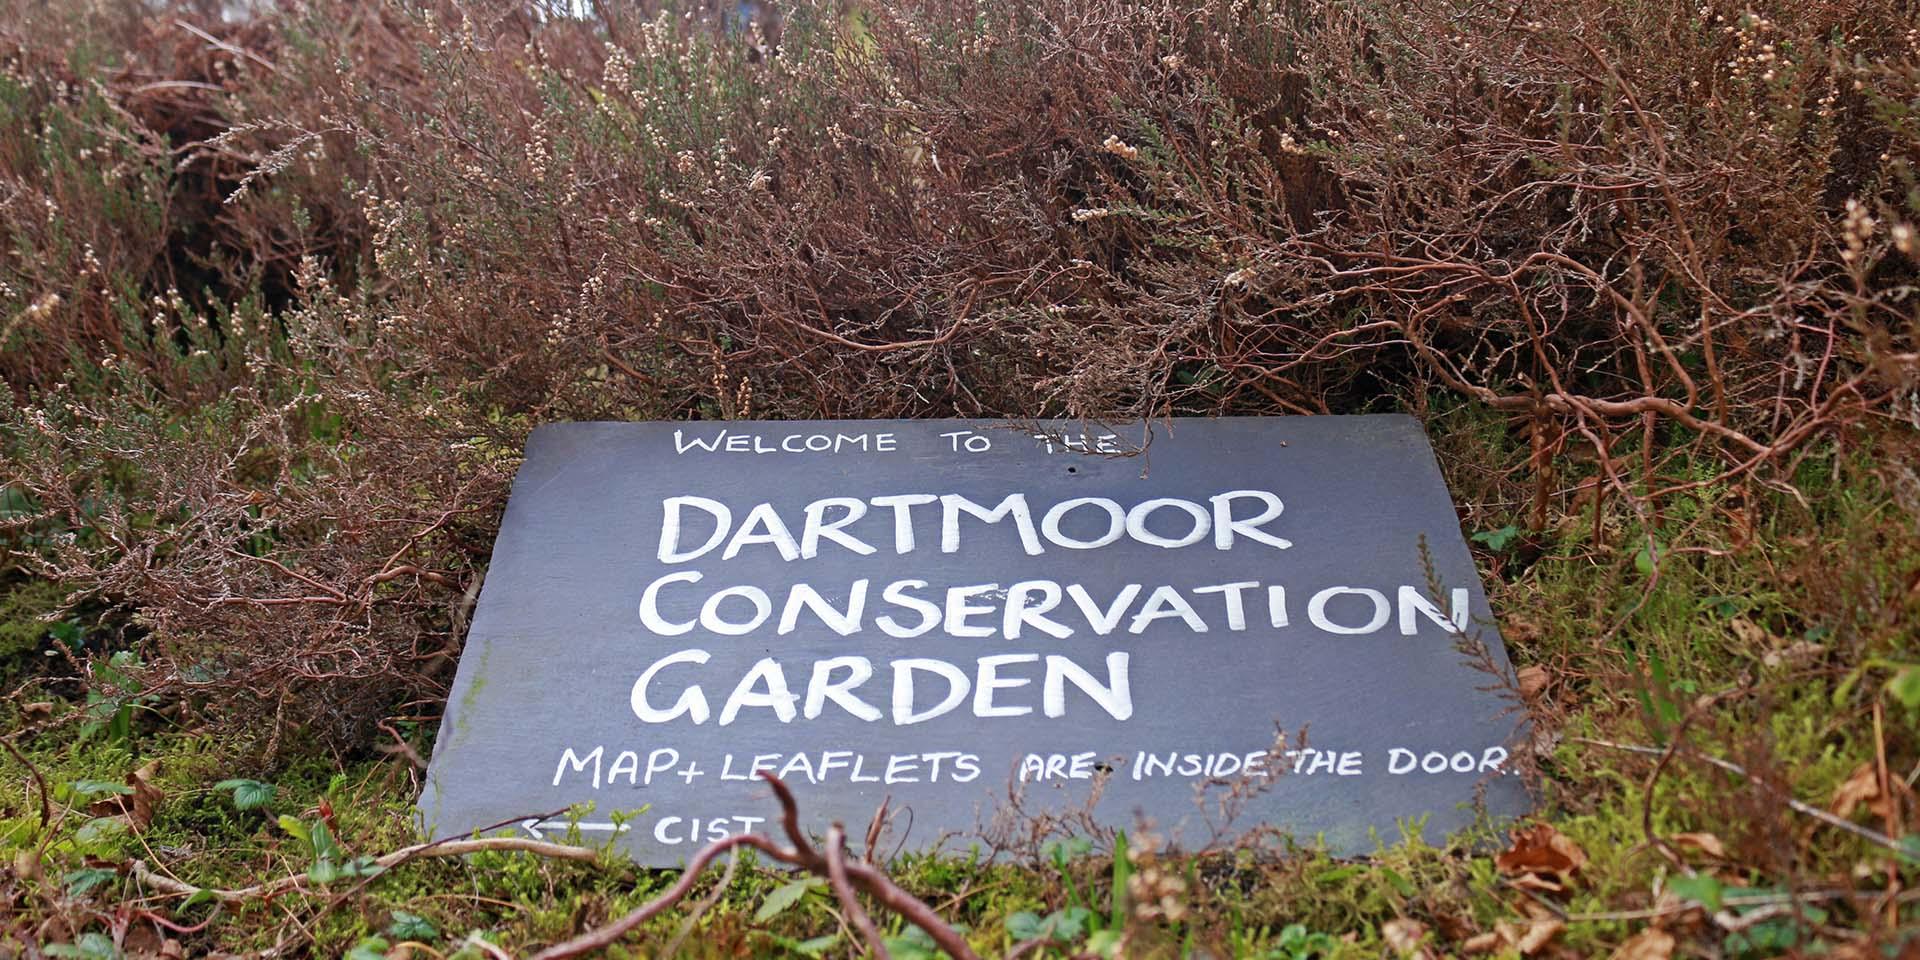 Sign for Dartmoor Conservation Garden